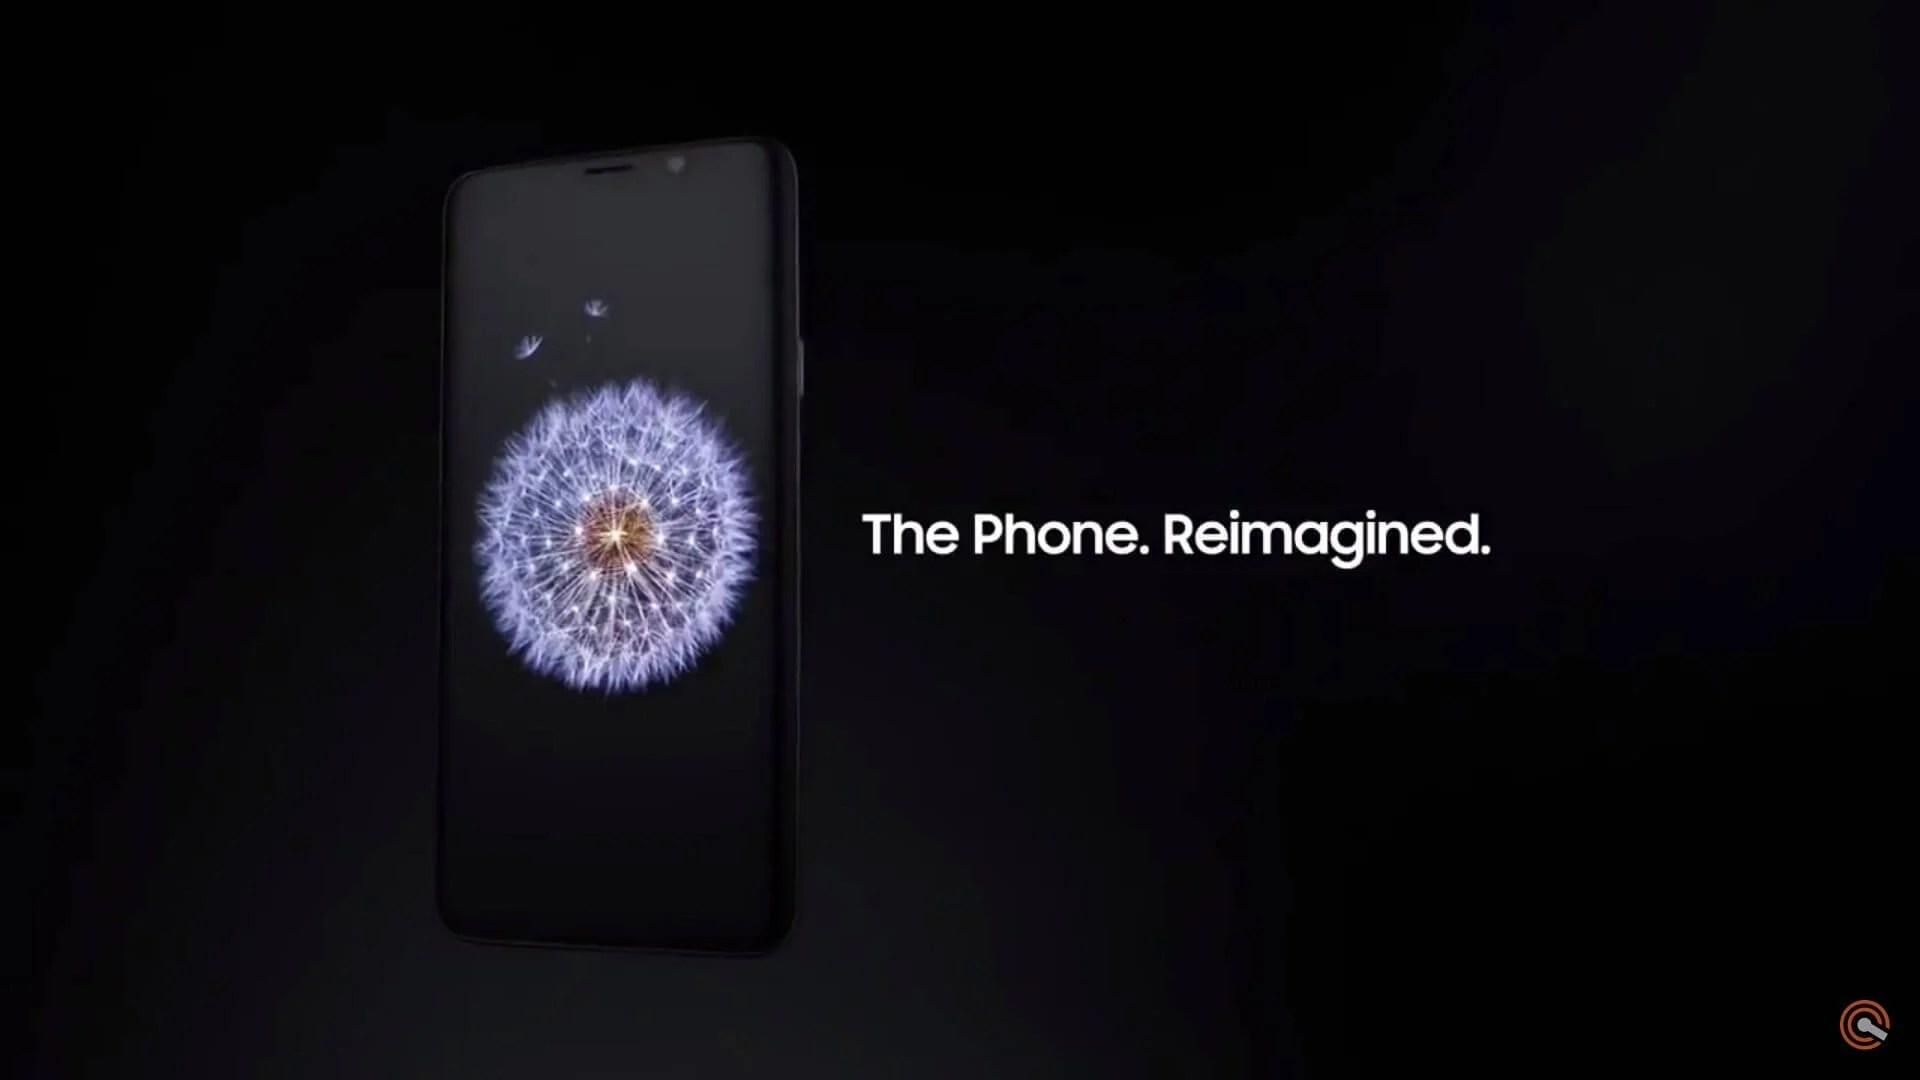 galaxys9leak galaxy s9 leaked video - Vídeo institucional do Galaxy S9 e S9+ vaza na internet